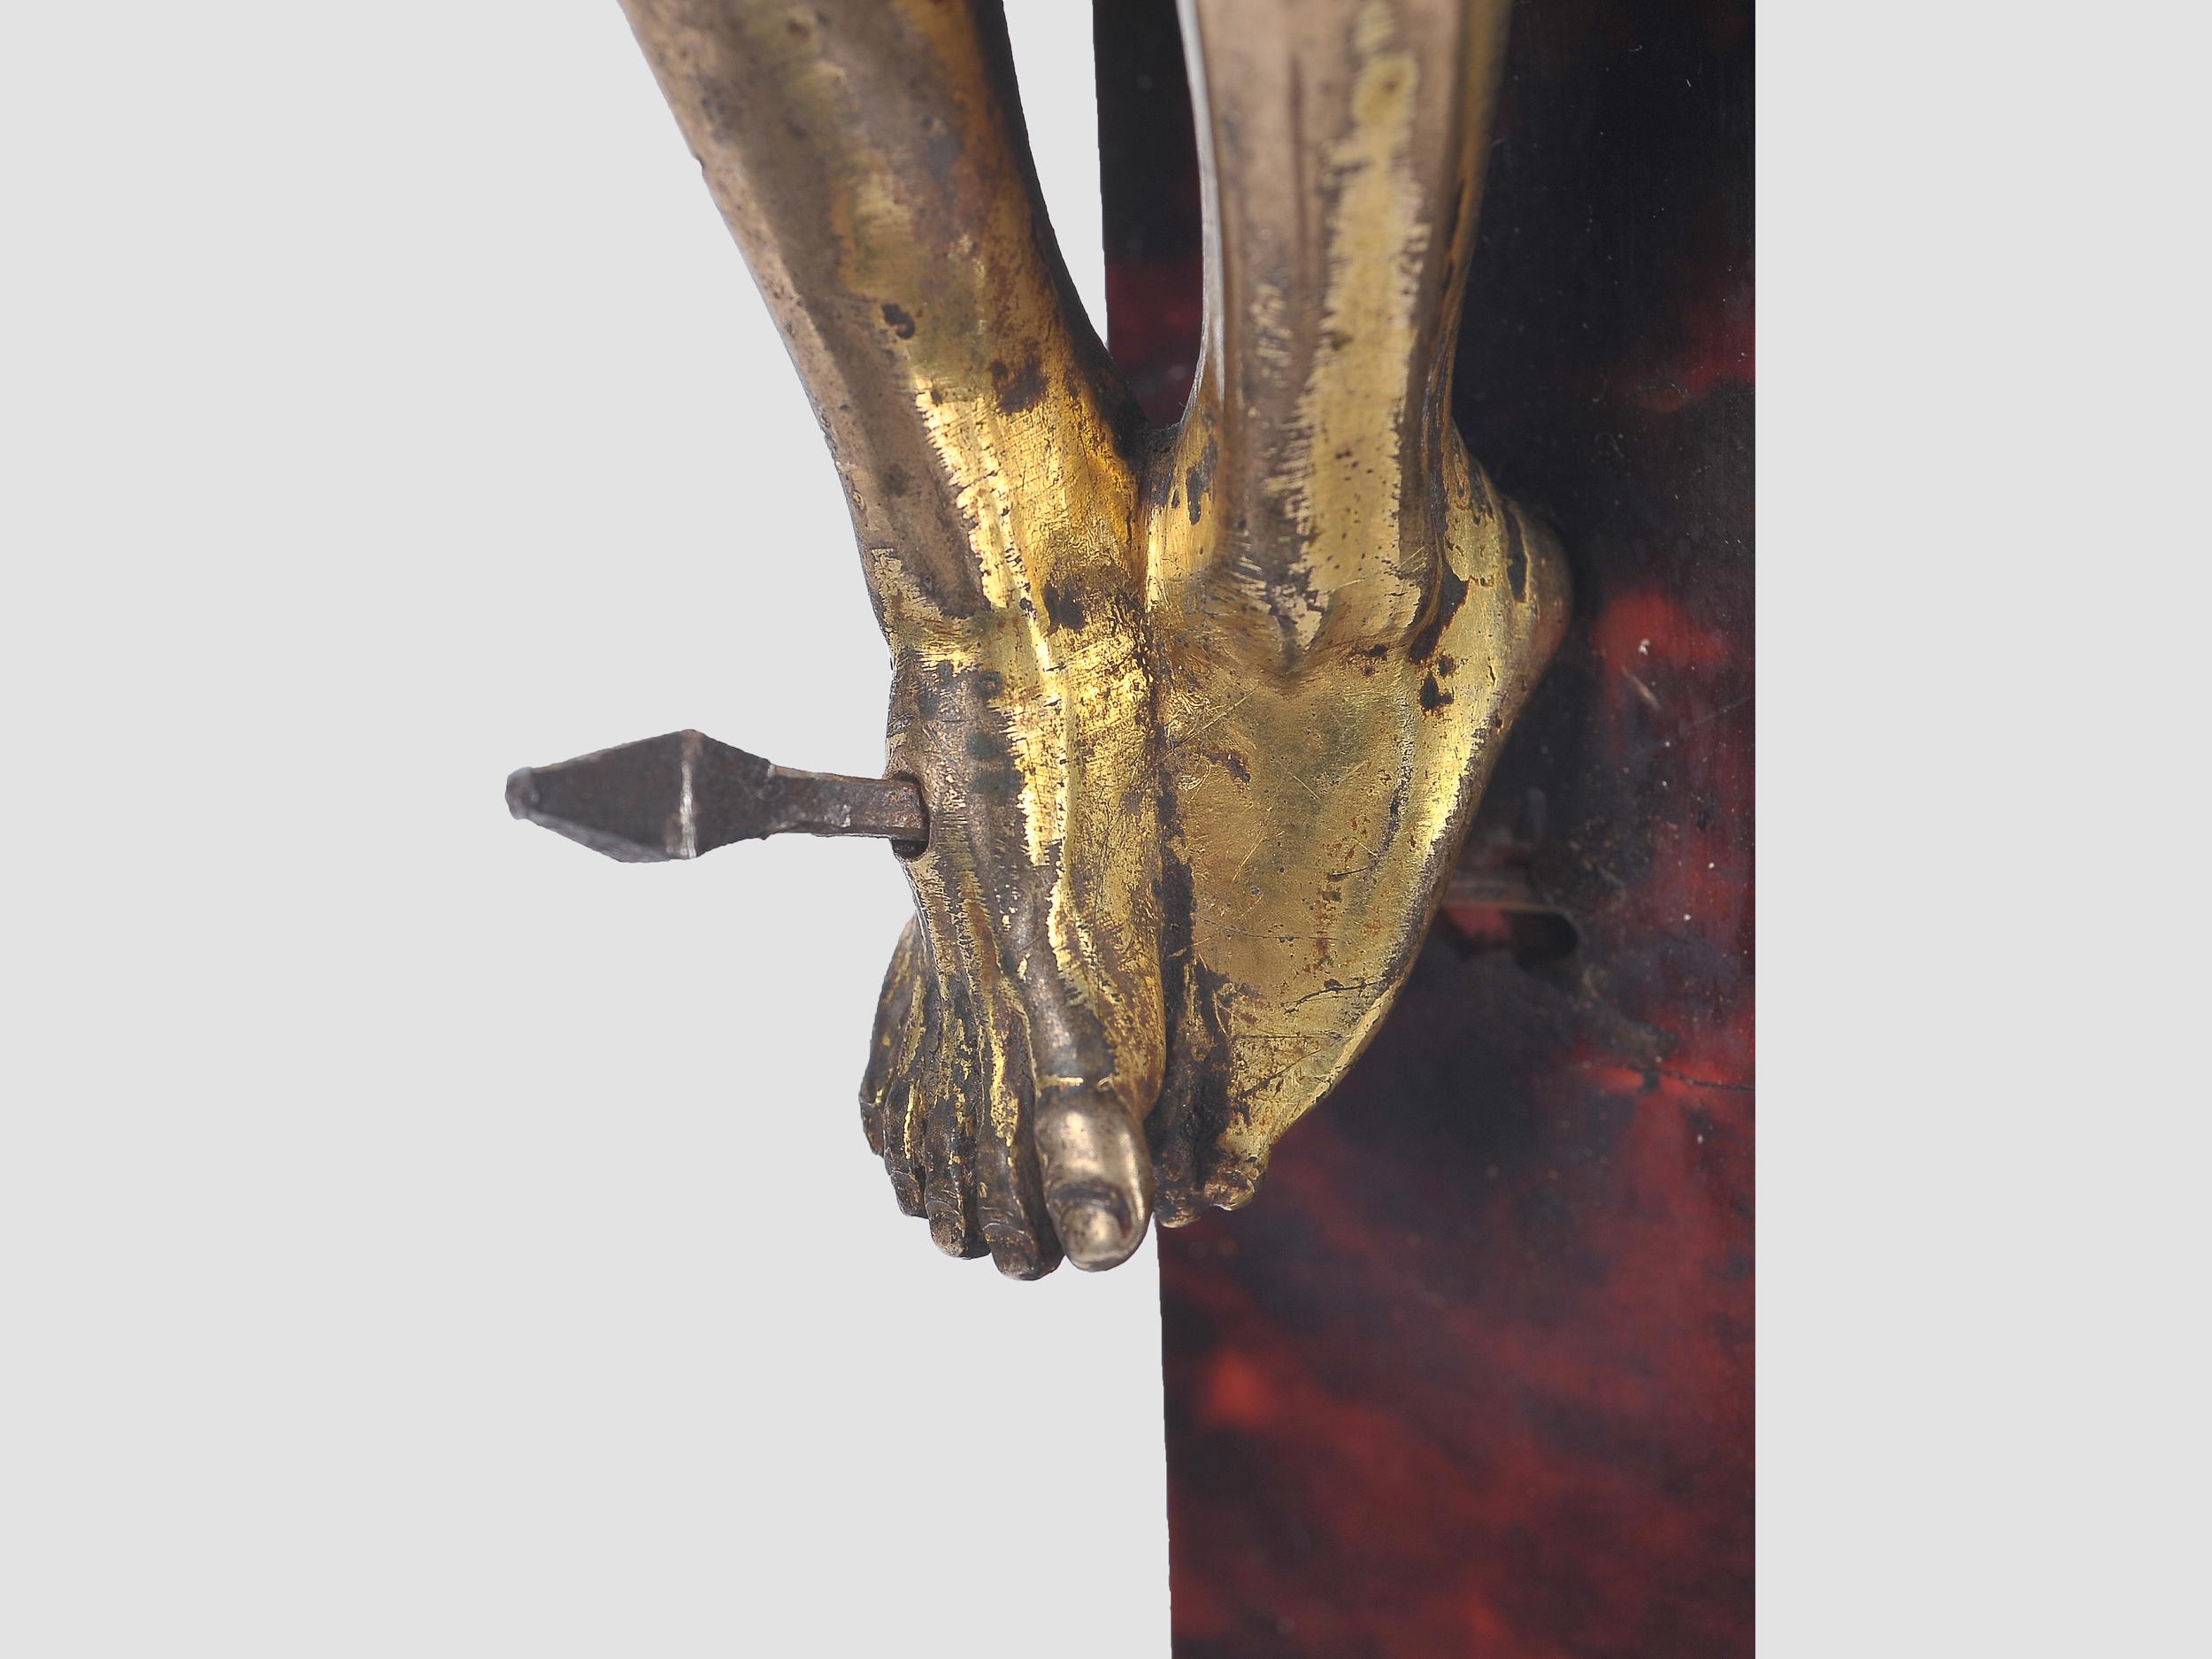 Corpus Christi, Savero da Ravenna 1496-1538 (Umkreis), Bronze - Image 6 of 9